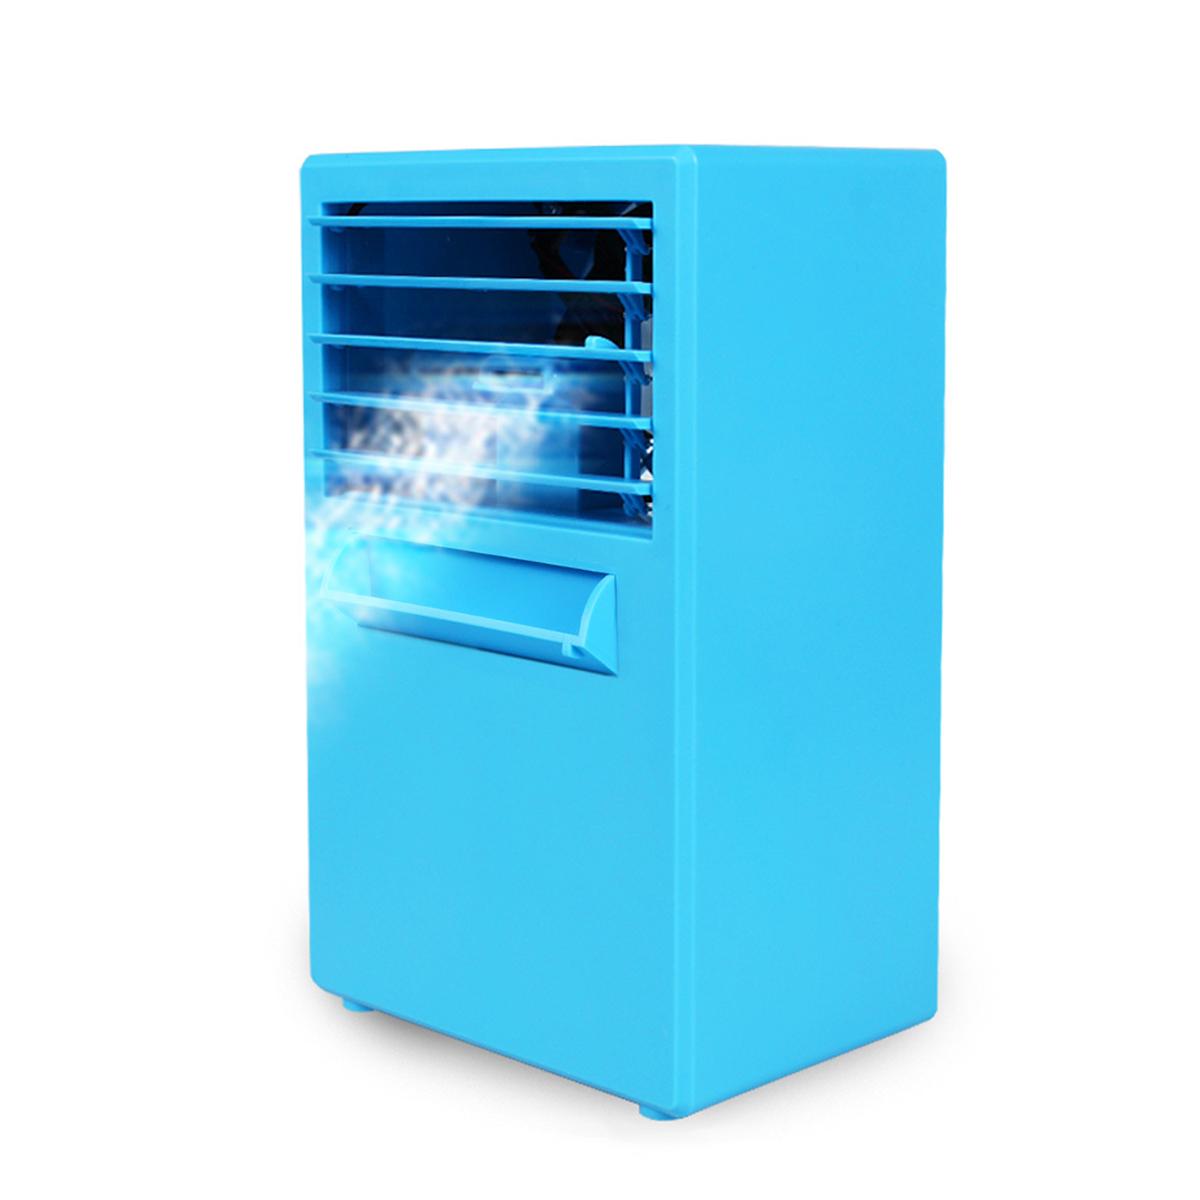 24v Portable Mini Conditioner Fan Usb Air Cooler Camping